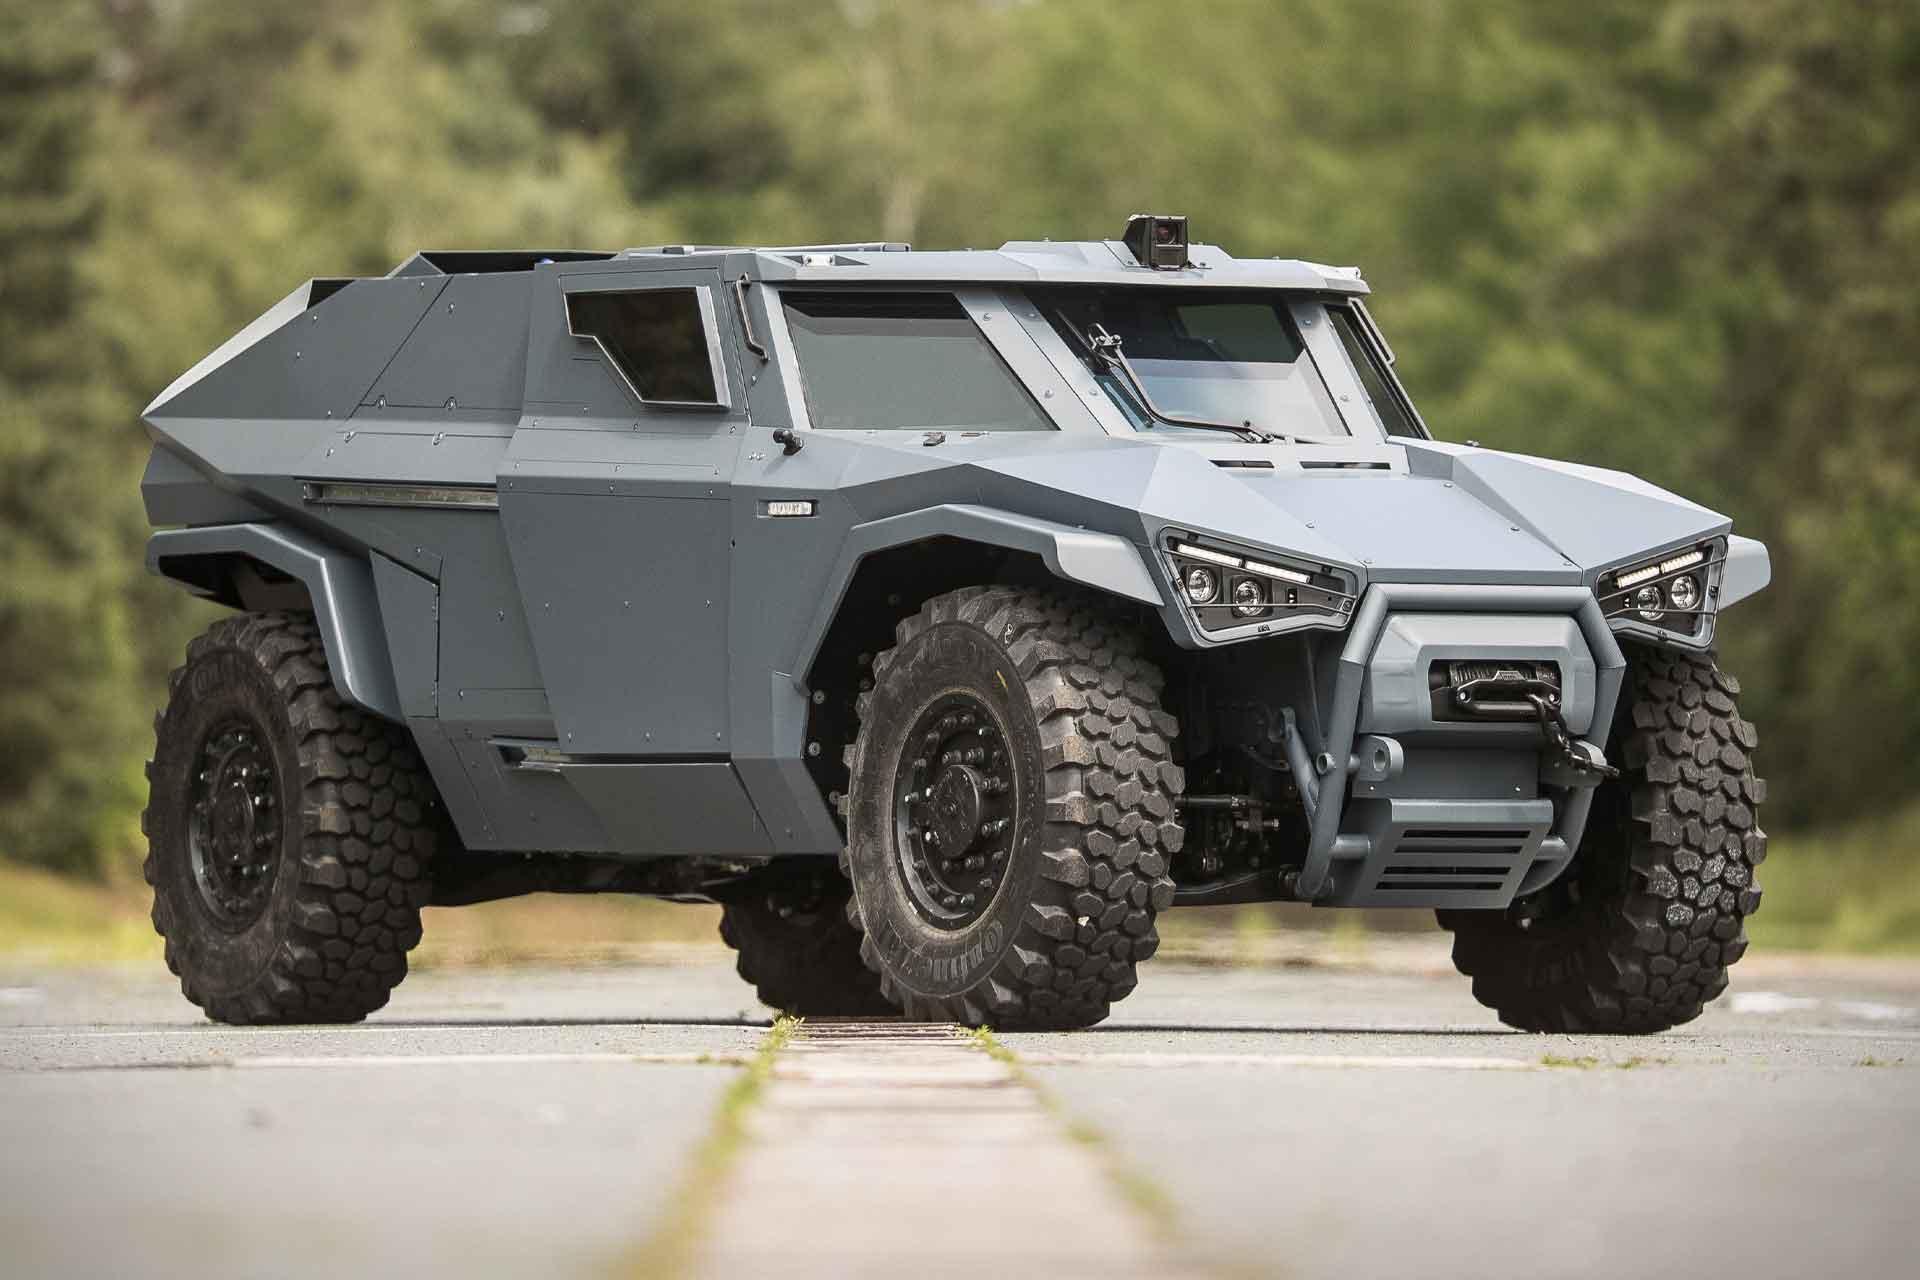 Arquus Scarabee Armored Vehicle | Uncrate